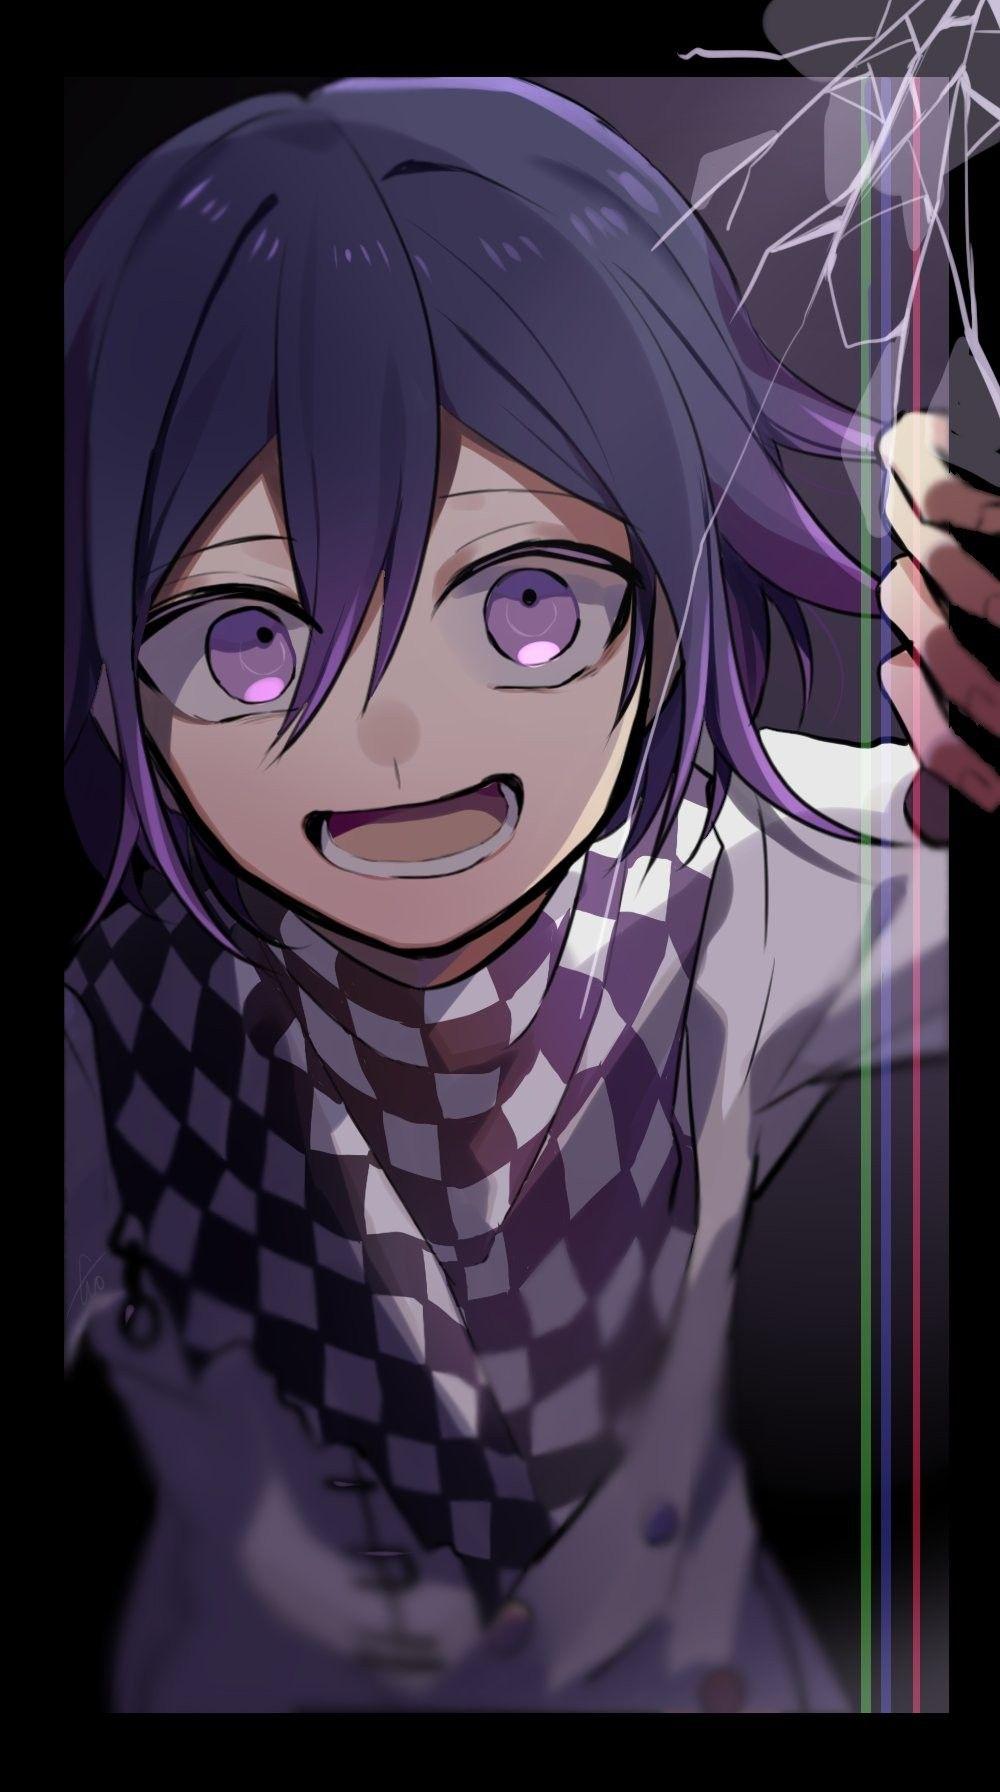 Fuo On Twitter In 2020 Danganronpa Cute Anime Wallpaper Danganronpa Characters